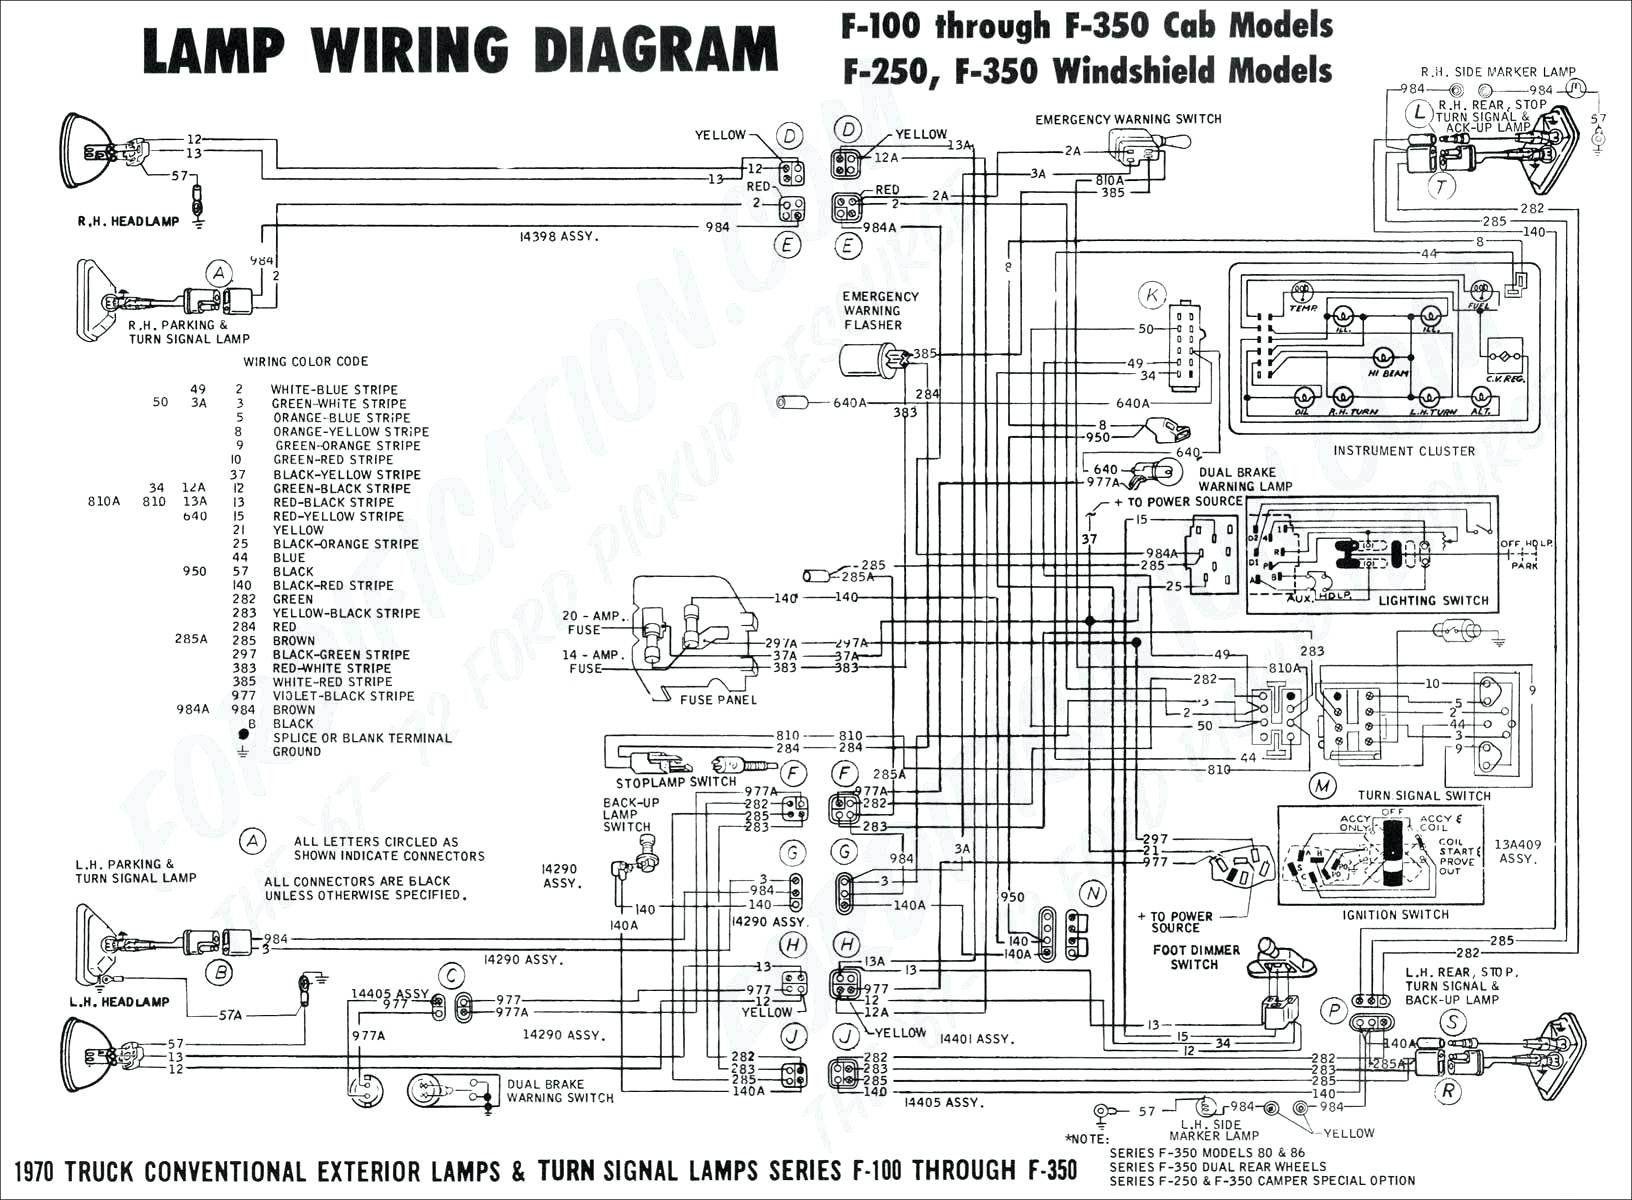 [WQZT_9871]  1996 Ford F350 Wiring Diagram 1990 Gmc Sierra Trailer Wire Harness - fisher- wire.jambu.astrea-construction.fr | 1996 Ford F250 Wiring Schematic |  | ASTREA CONSTRUCTION